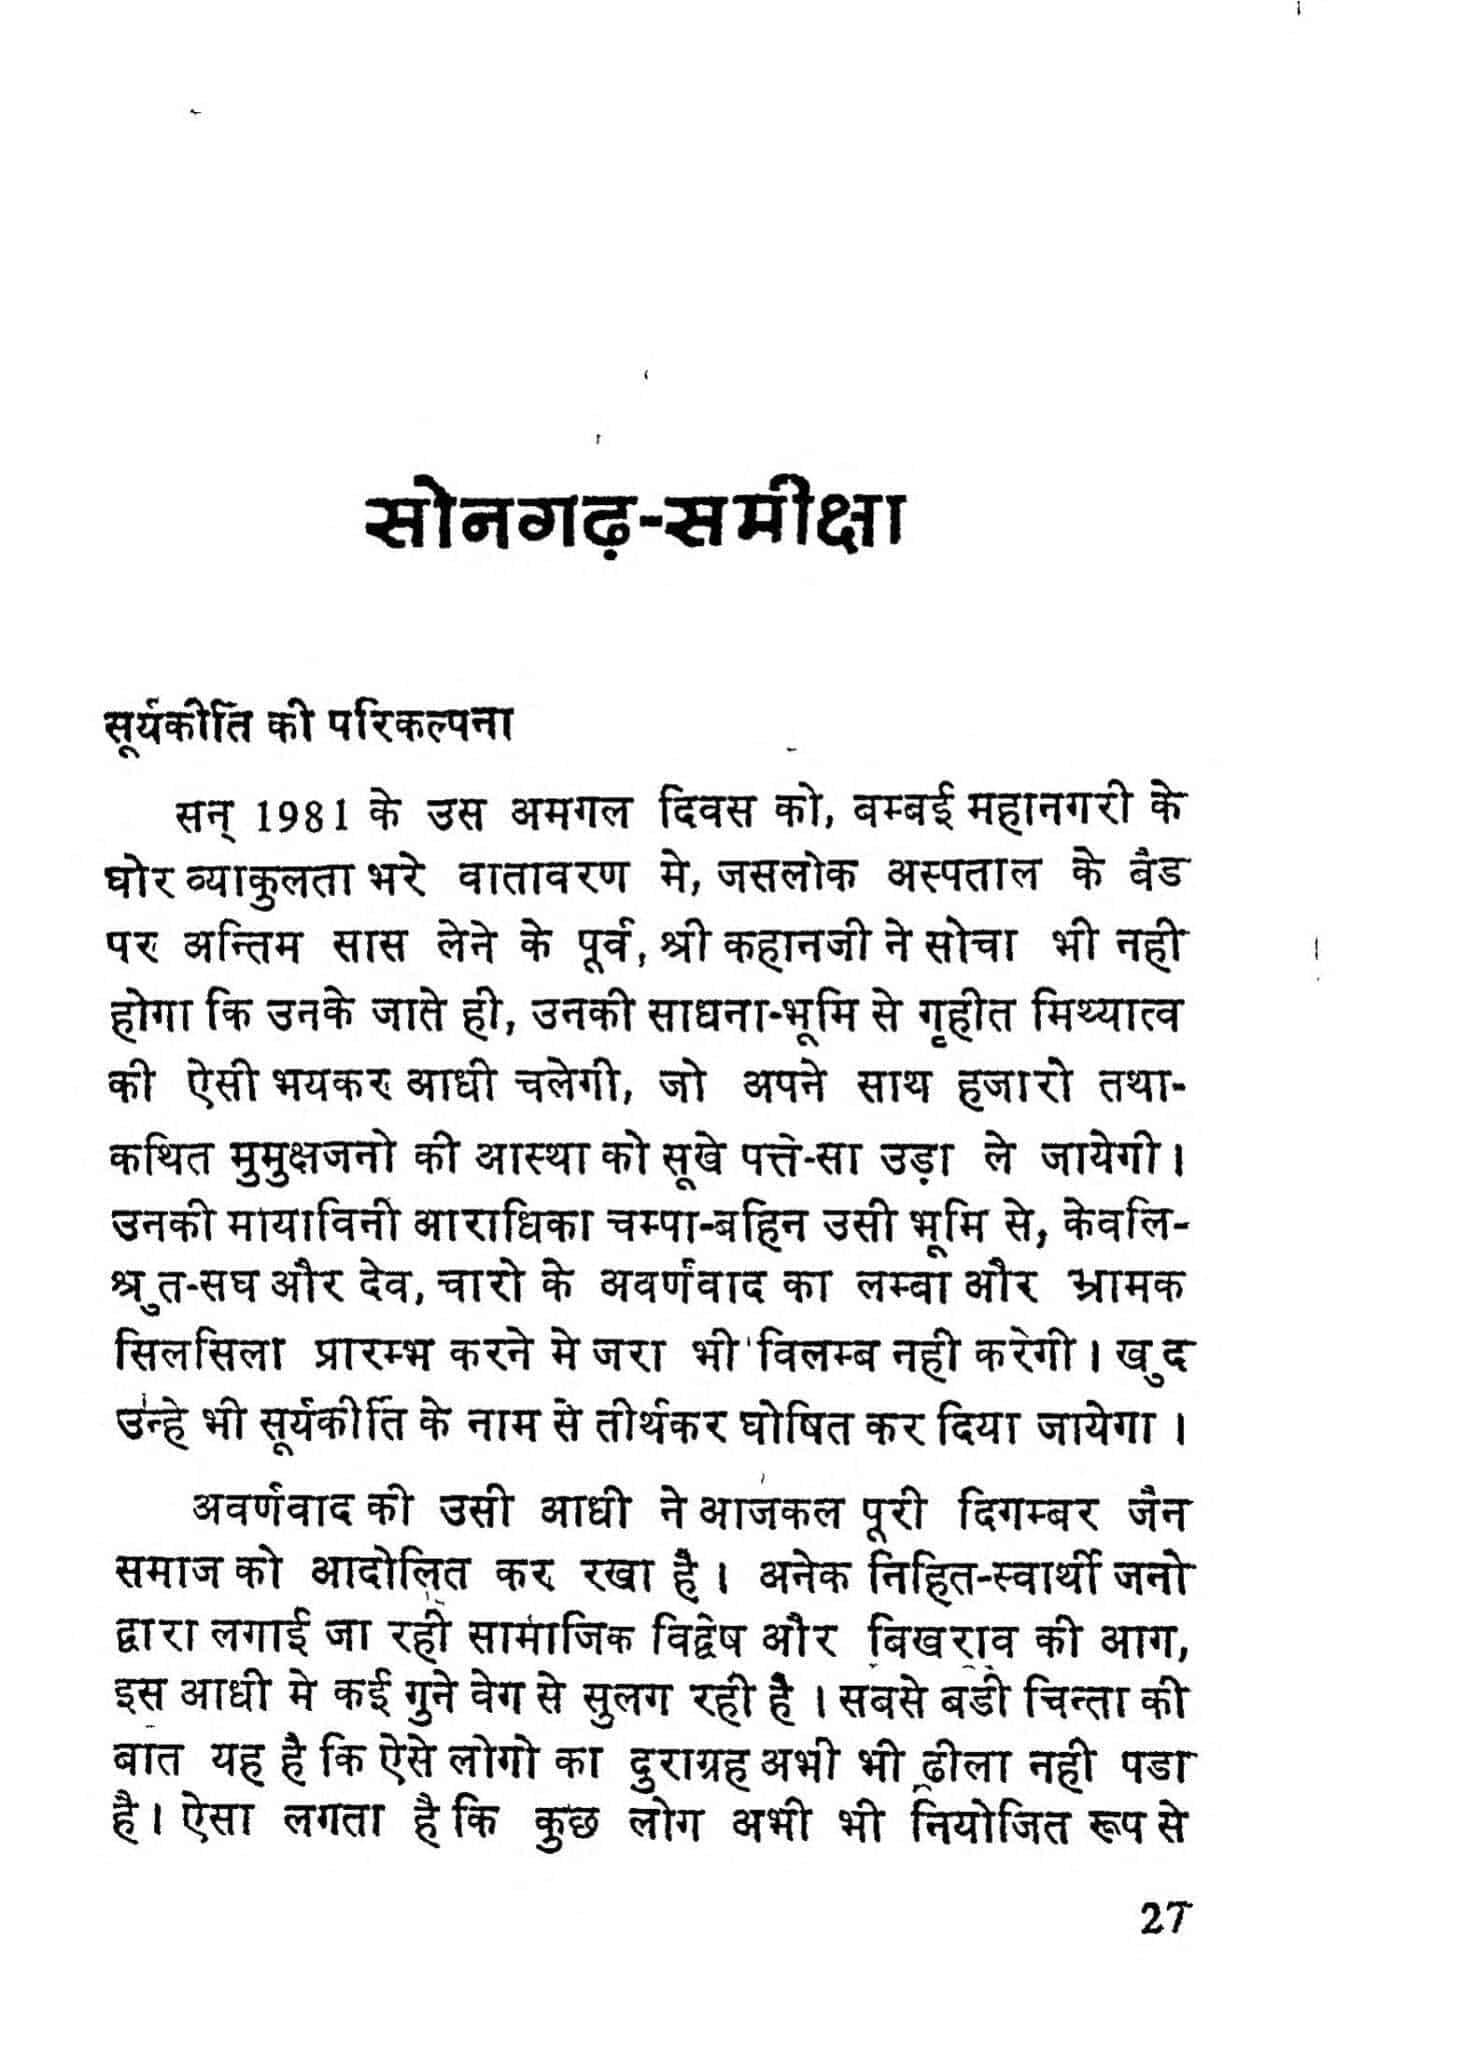 Book Image : सोनगढ़ - समीक्षा  - Songarh Samiksha